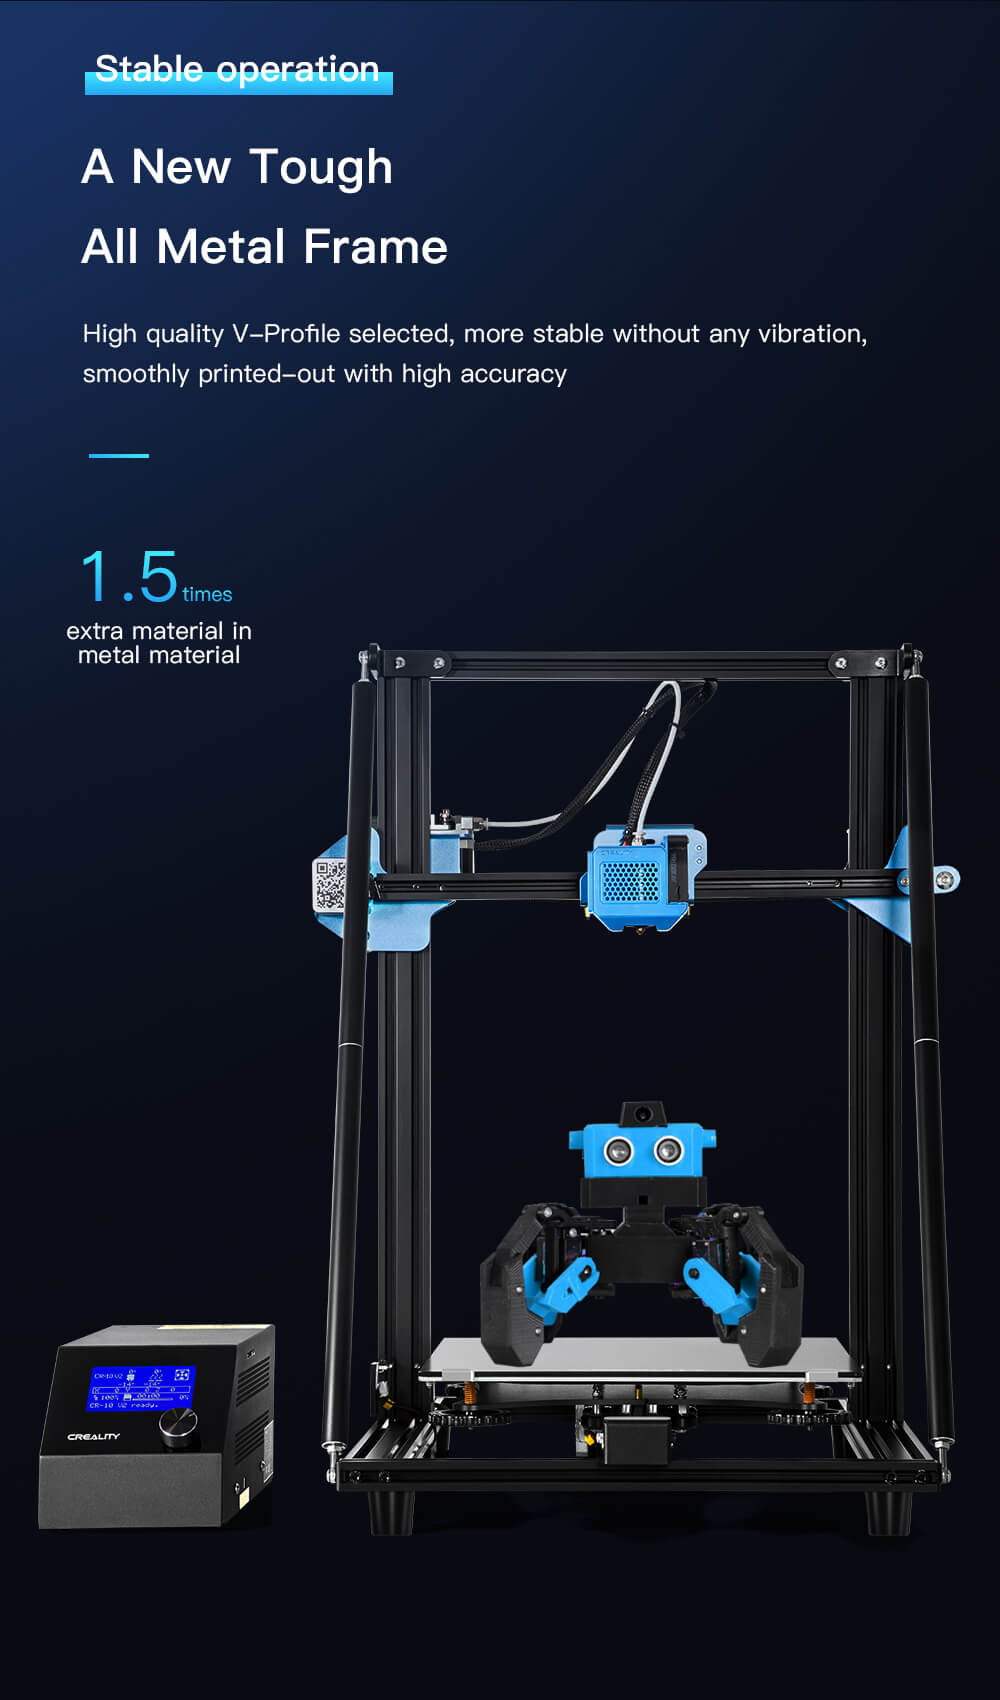 Creality CR-10 V2 3D-Drucker Bausatz - 300x300x400mm - Ganzmetallrahmen